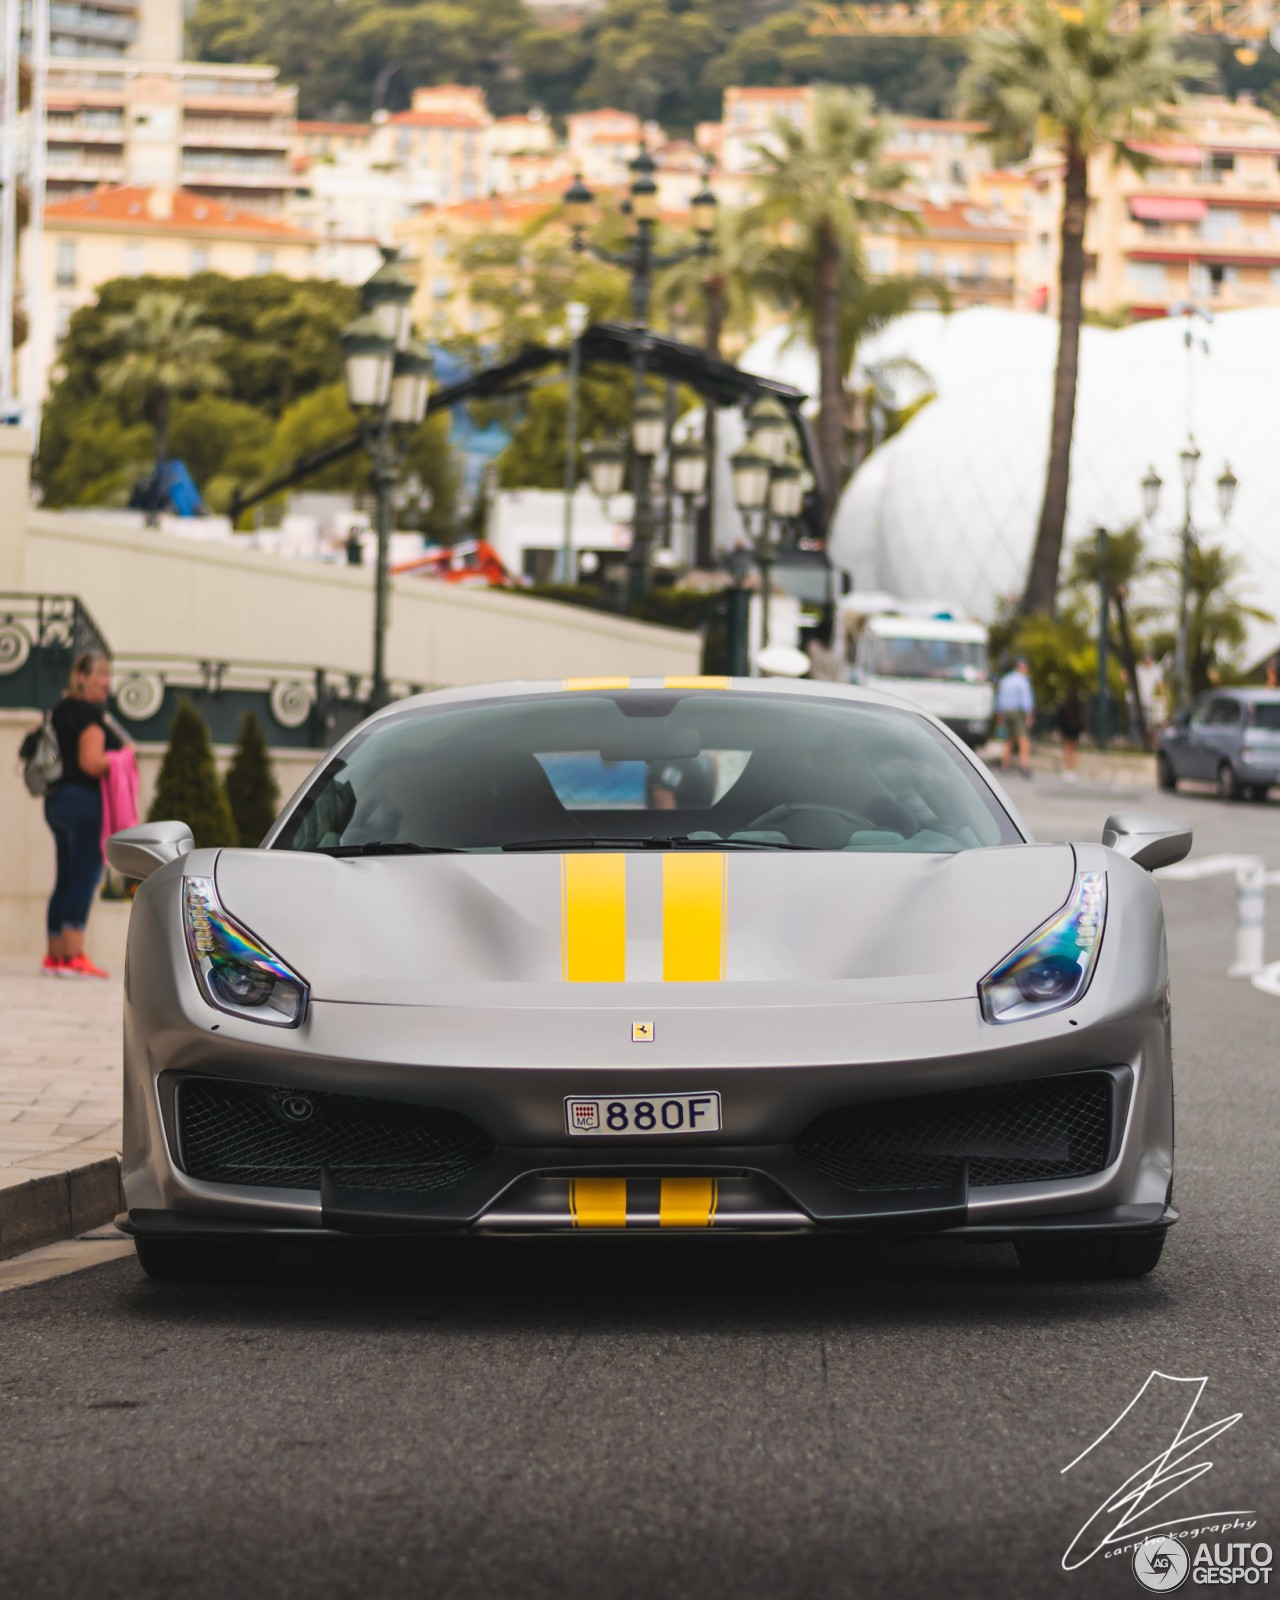 Ferrari Models History Photo Galleries Specs Autoevolution >> Matte Grey Ferrari 488 Pista With Yellow Stripes Is Not A Tame Spec